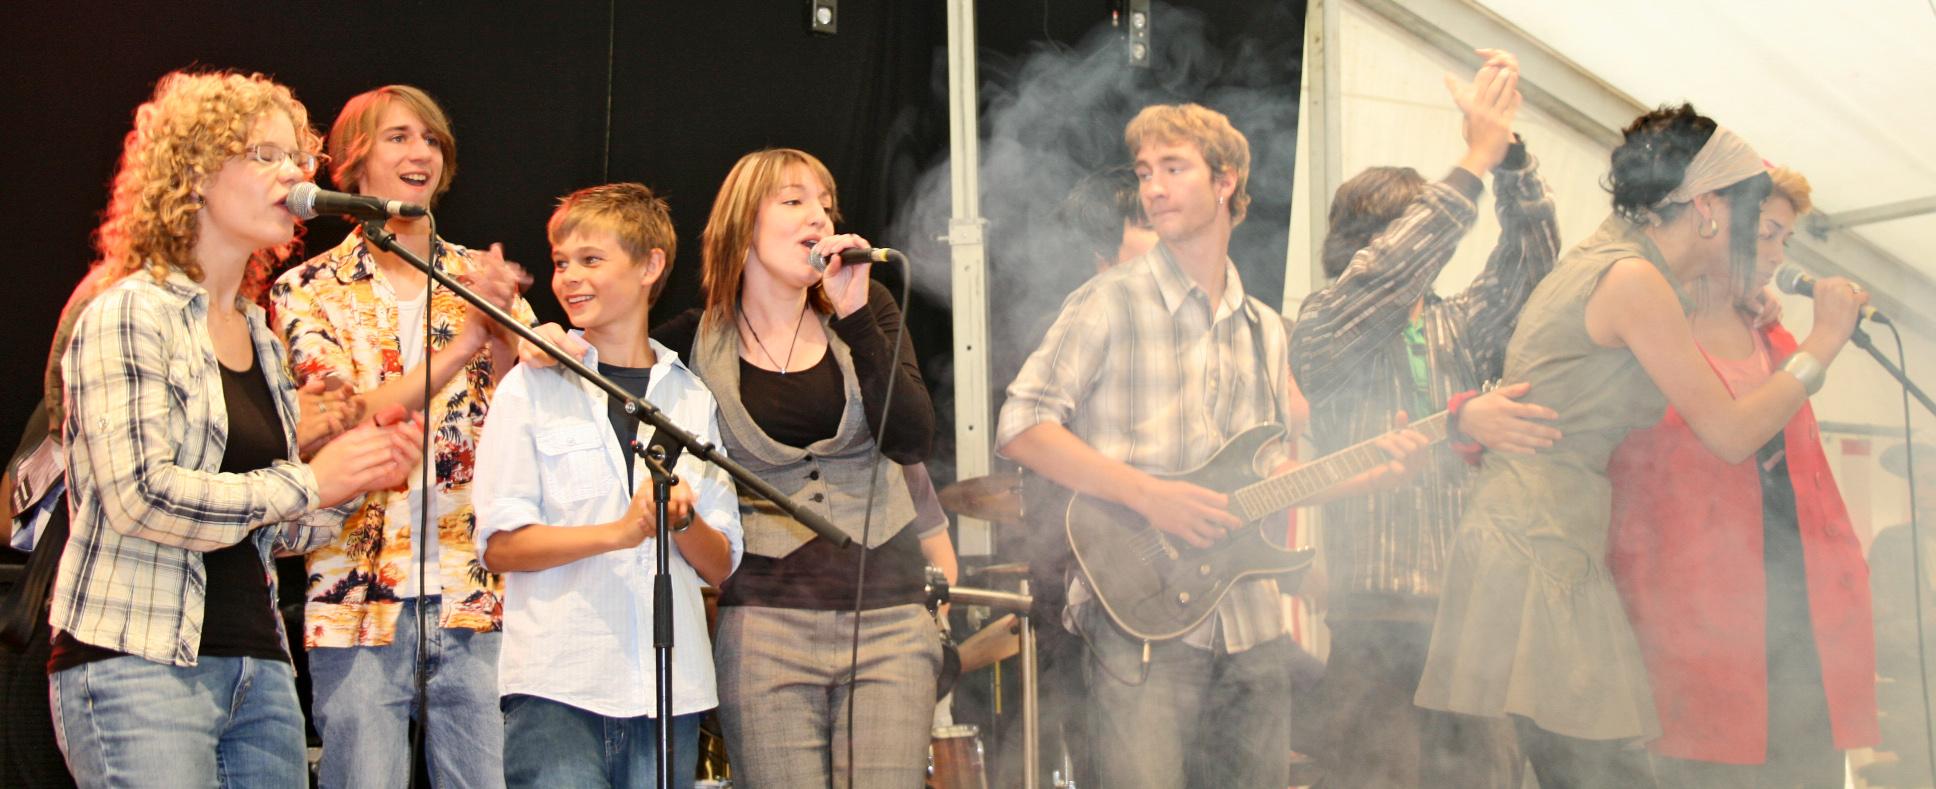 Concert groupe BBM74